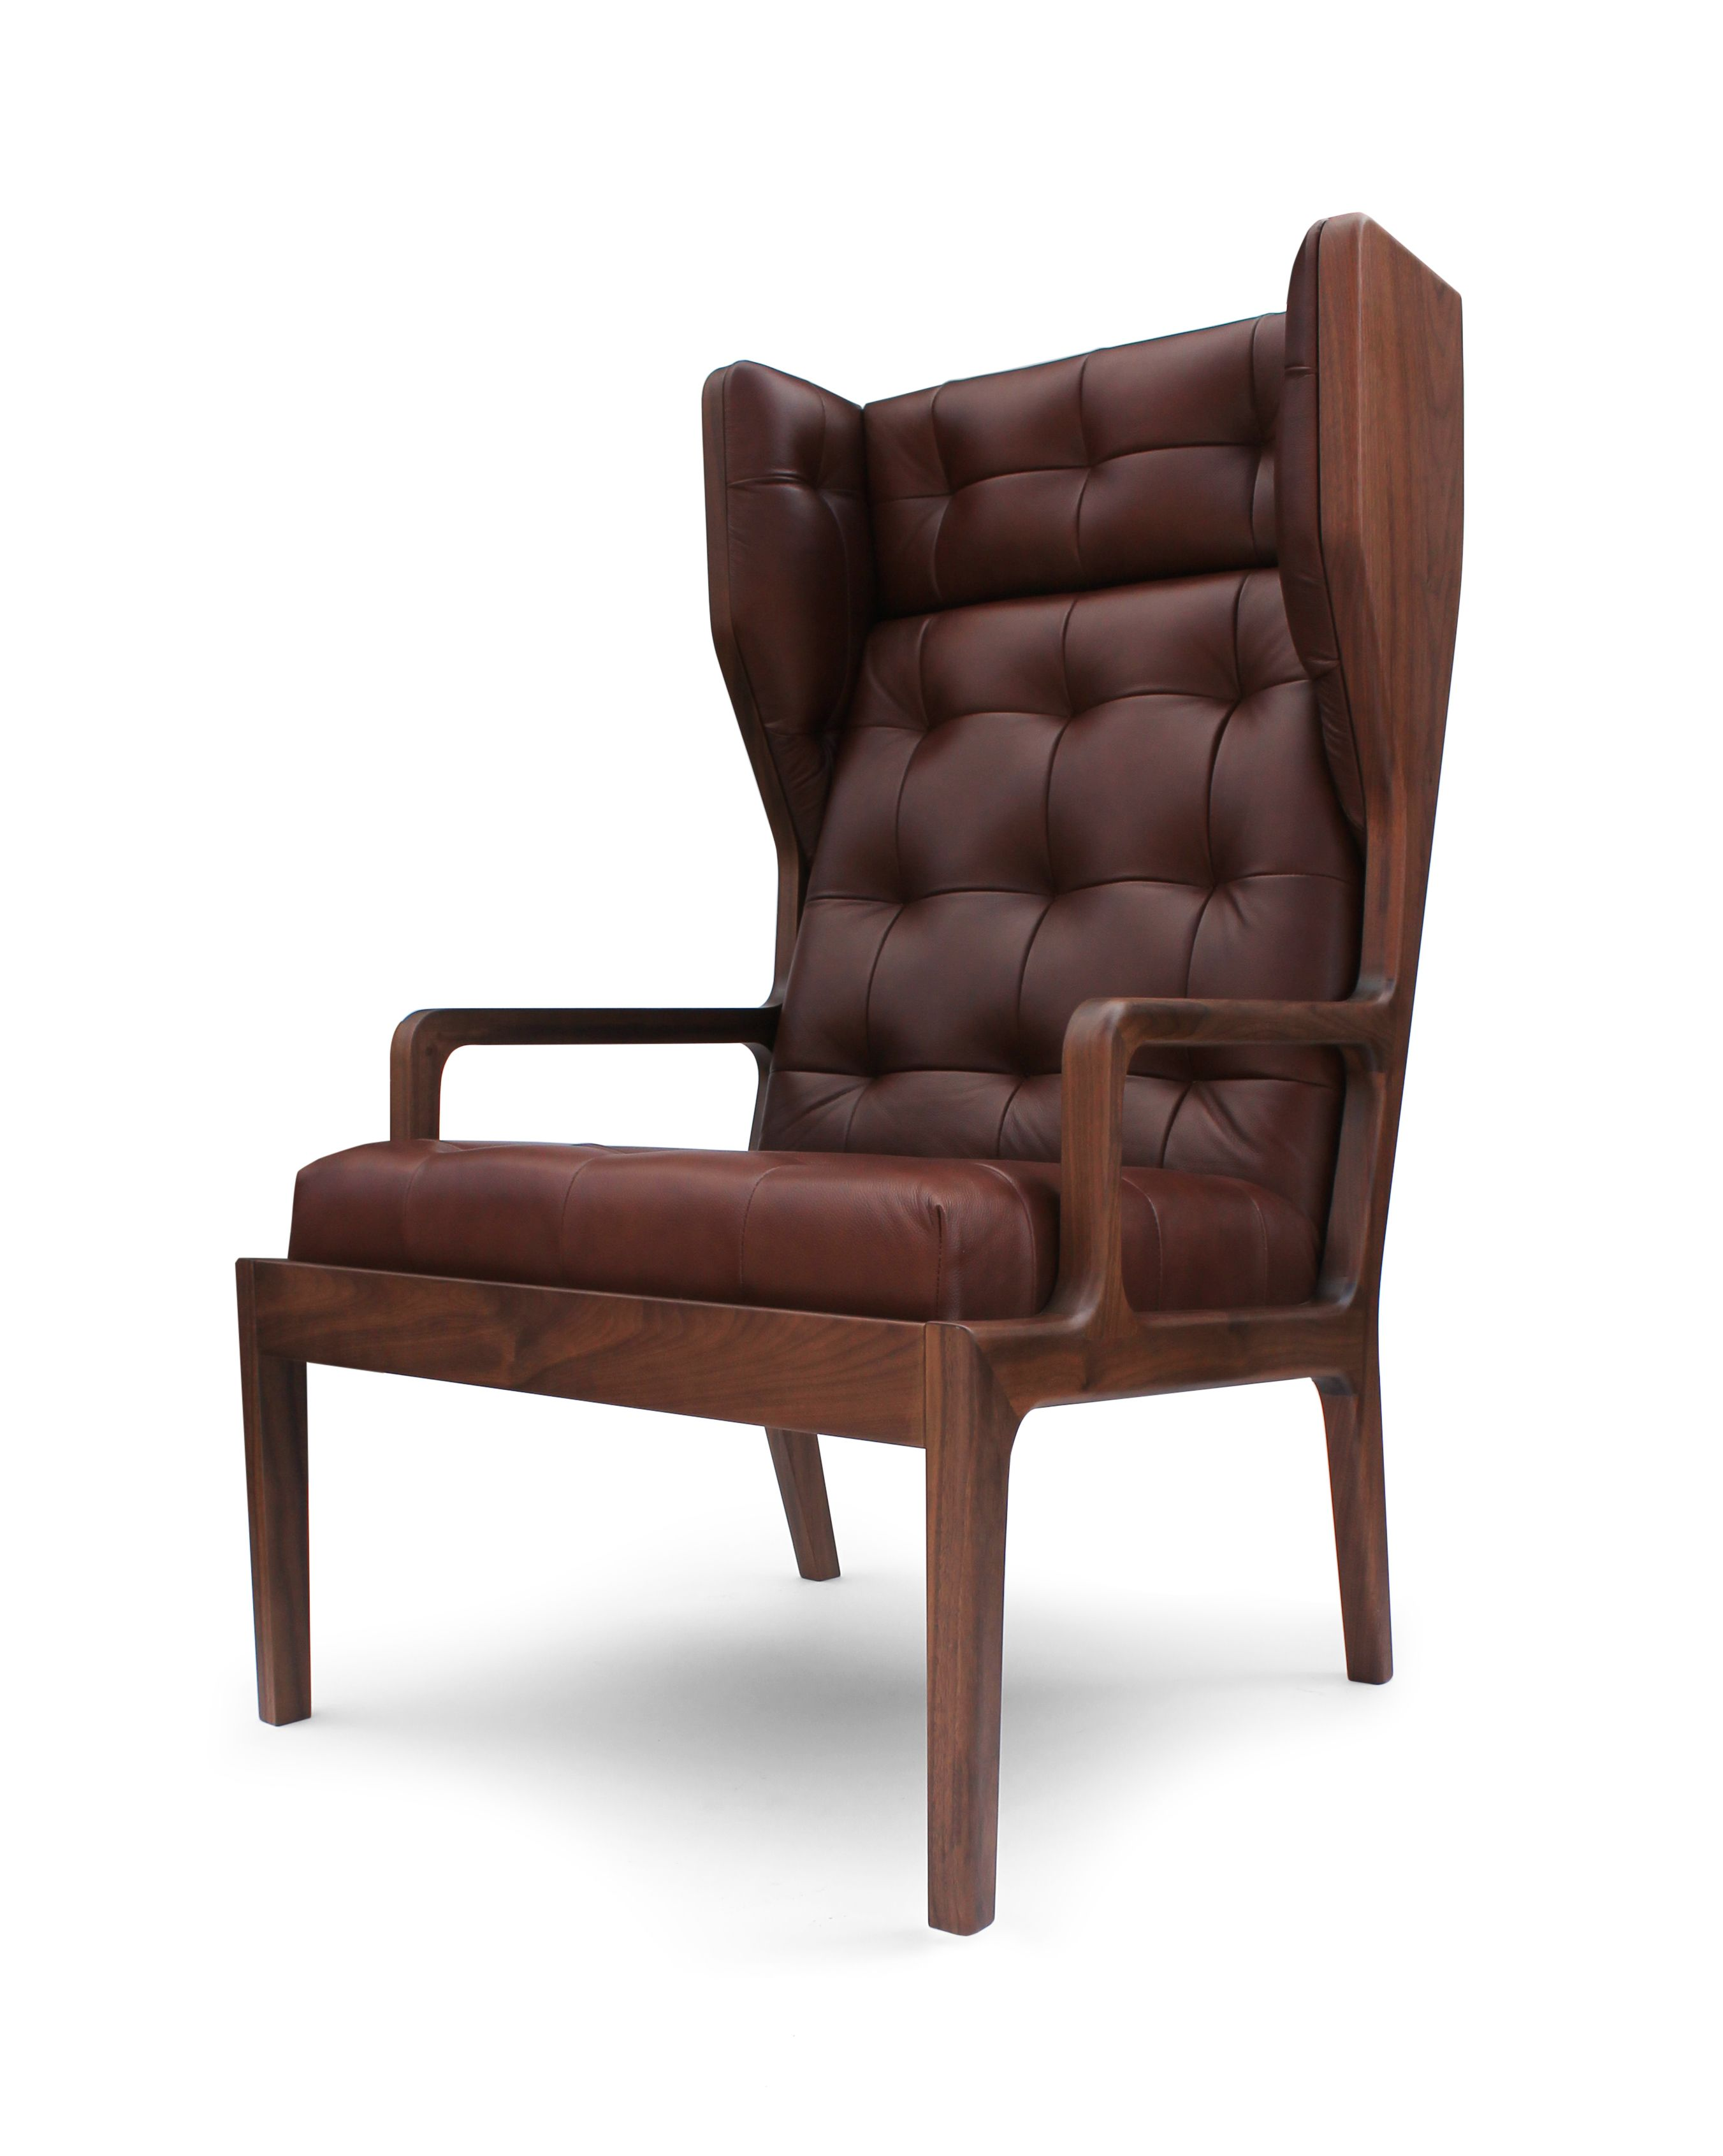 James UK Wing chair Wood furniture design, Modern